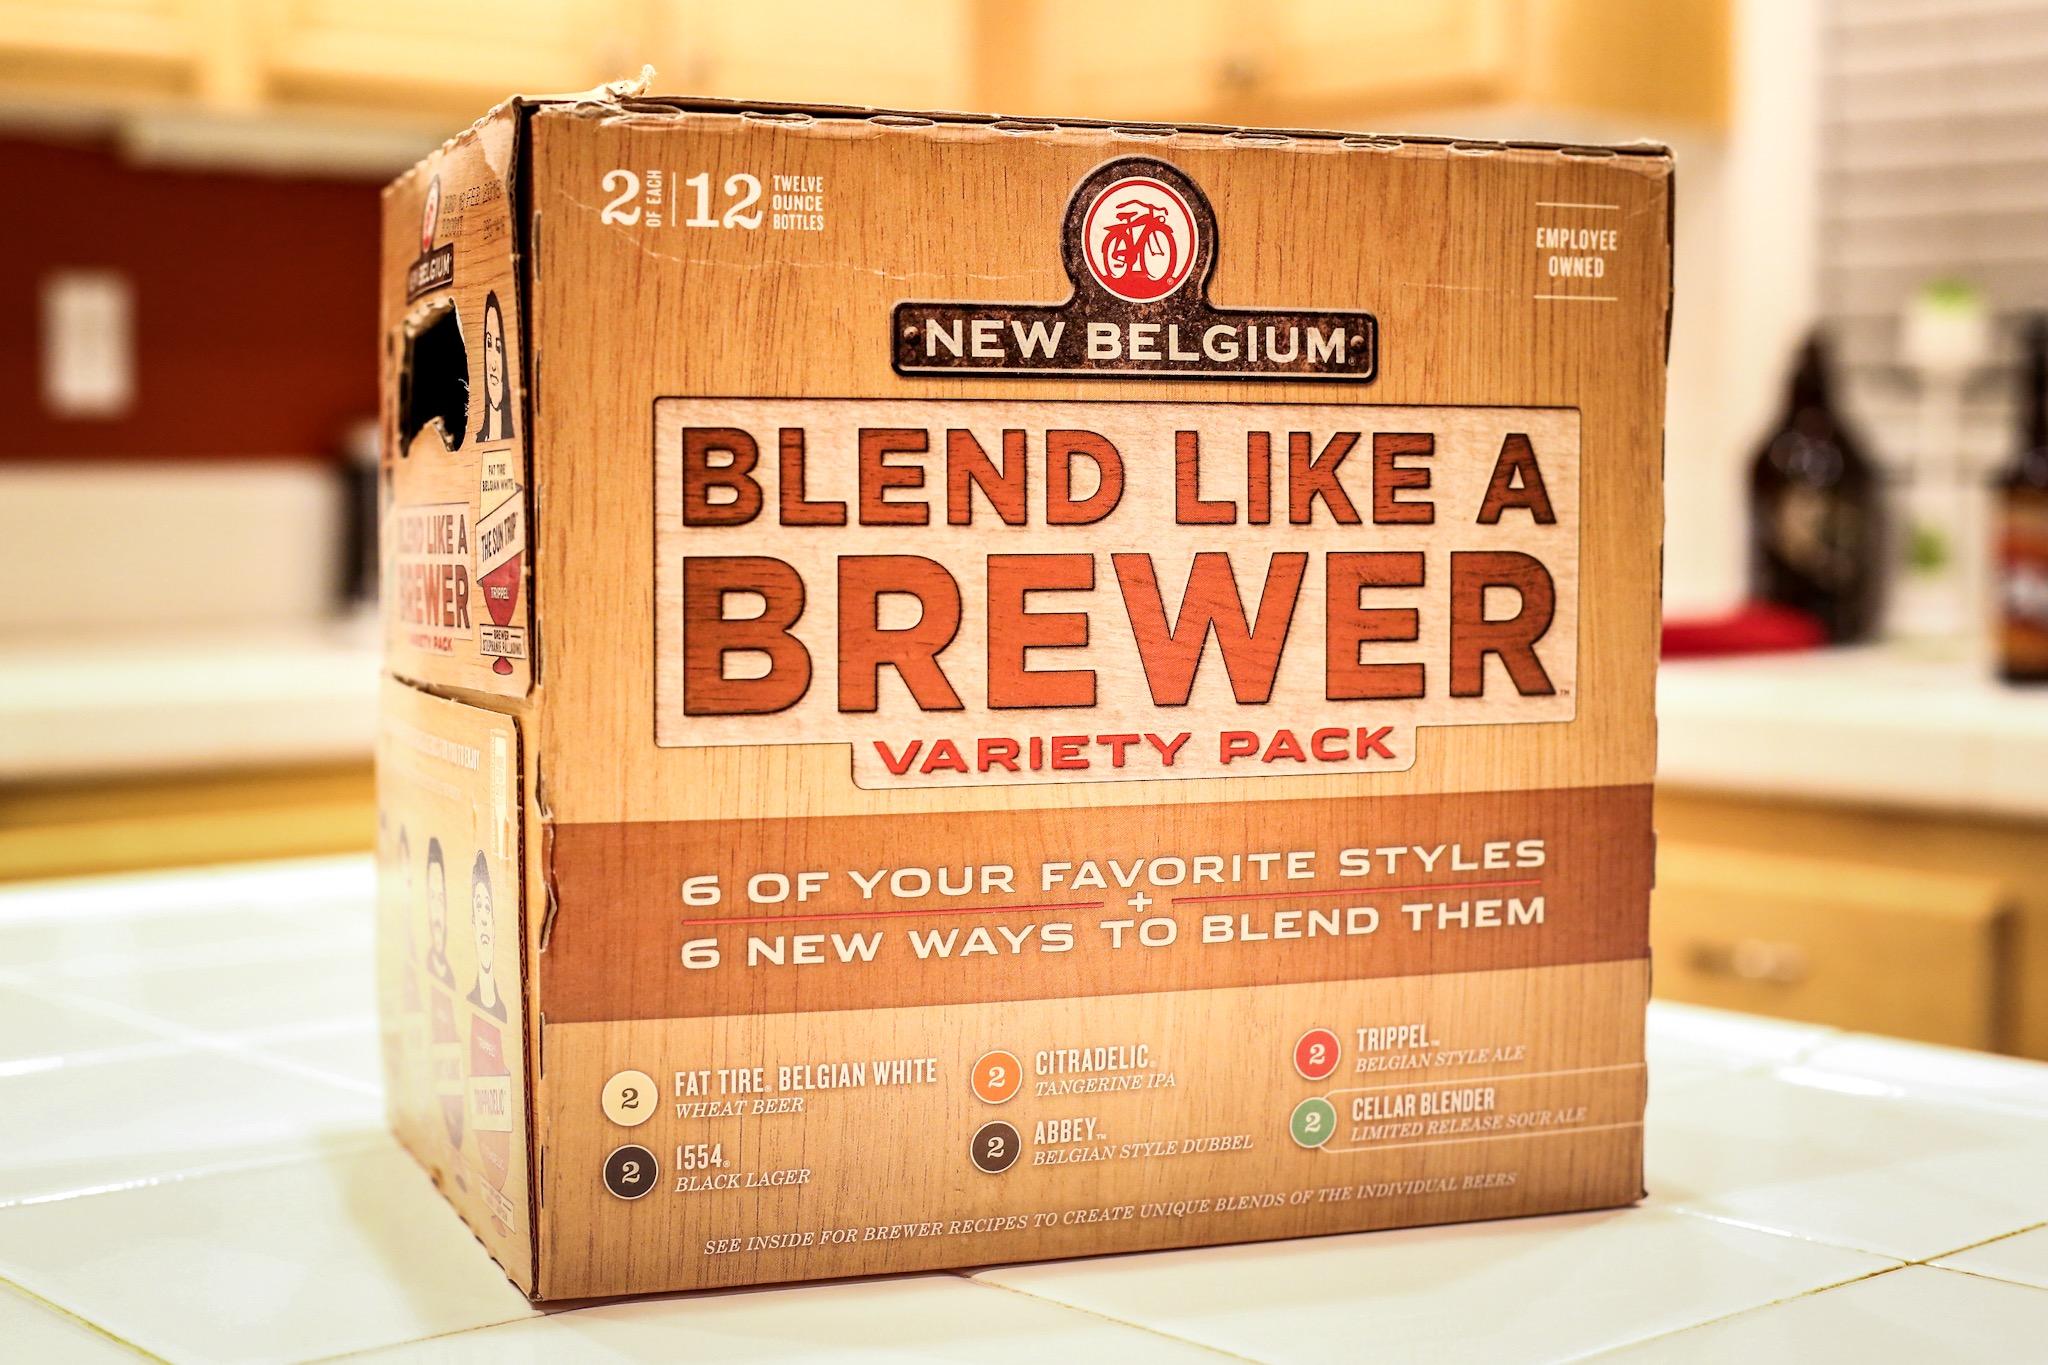 Blend Like a Brewer